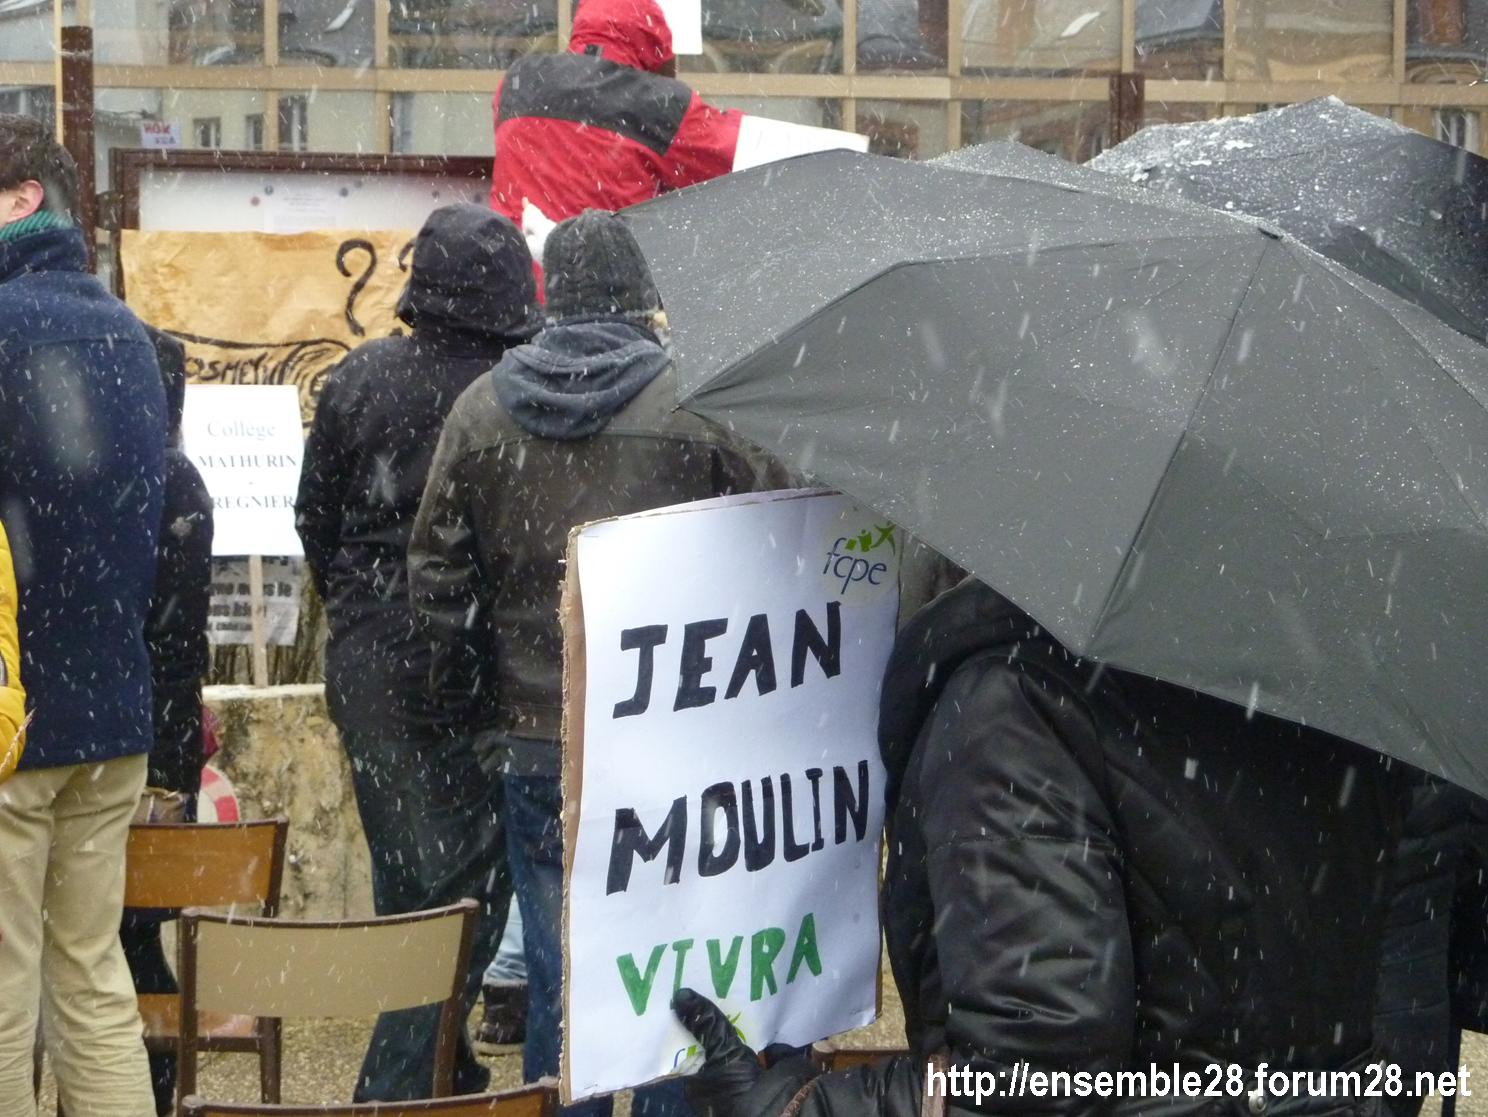 Chartres 13-02-2018 Rassemblement Fermeture Collège Jean-Moulin 02